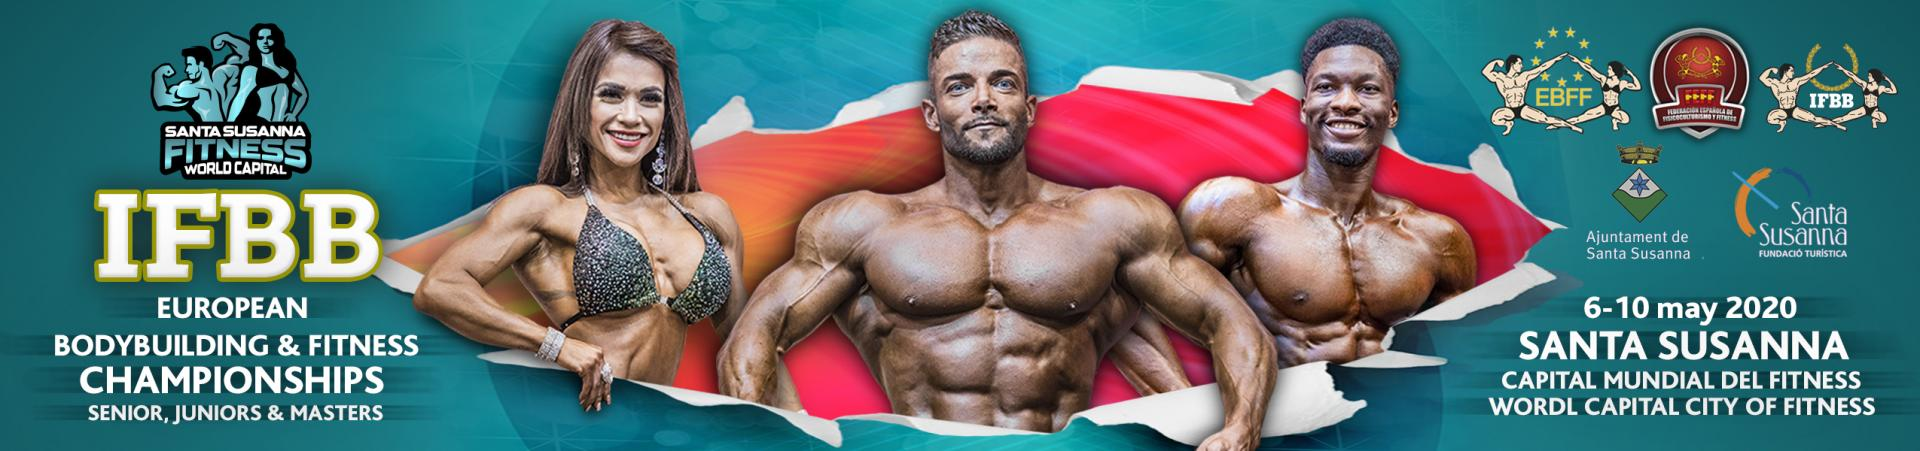 European championships 2020 banner